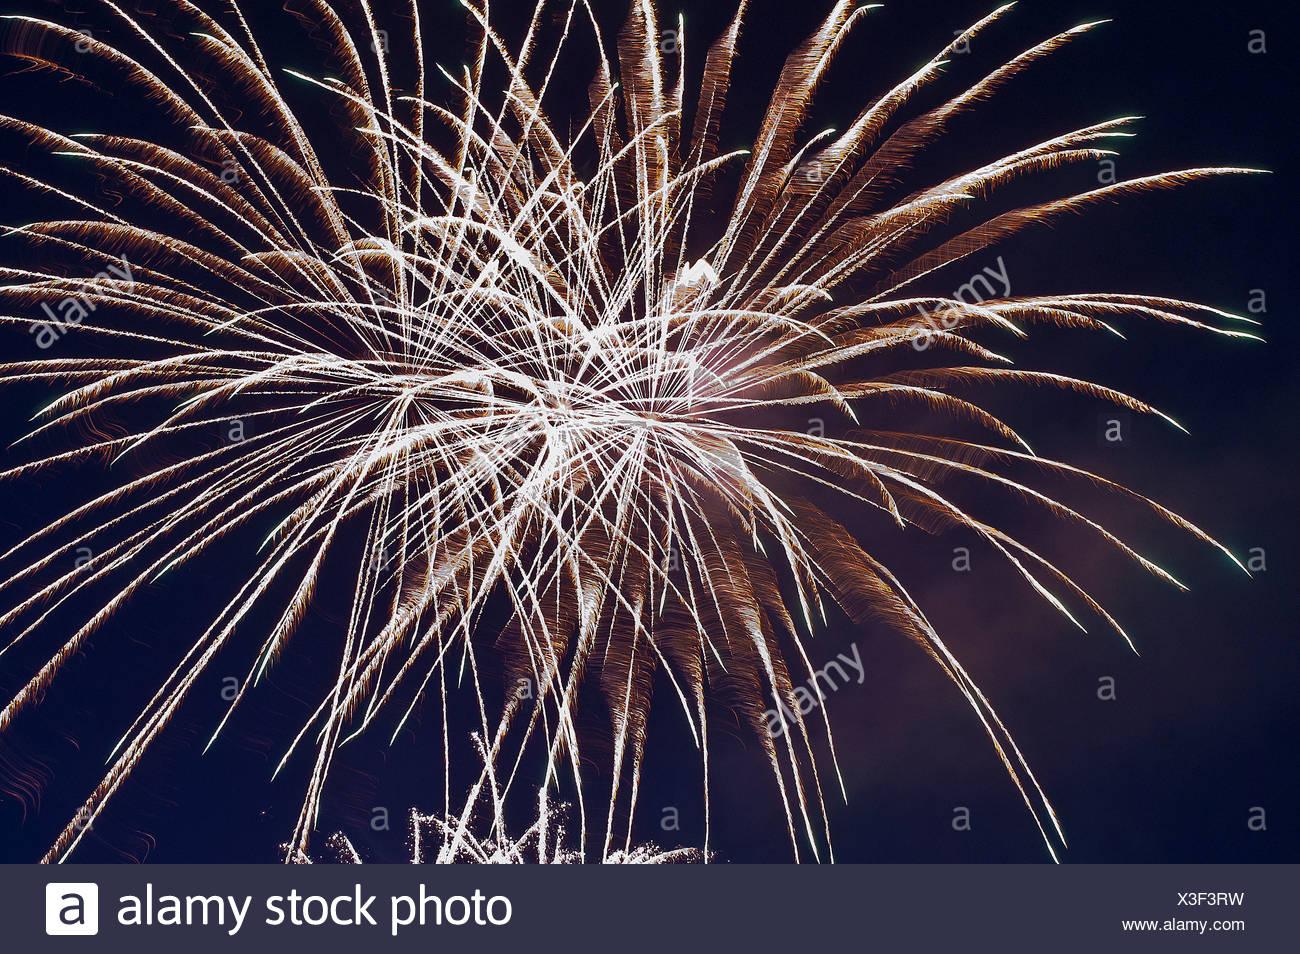 Fires, fireworks, pyrotechnics, rocket, rays, beams, explode, explosion, sky, darkly, sky, brightly, illuminates, light, - Stock Image